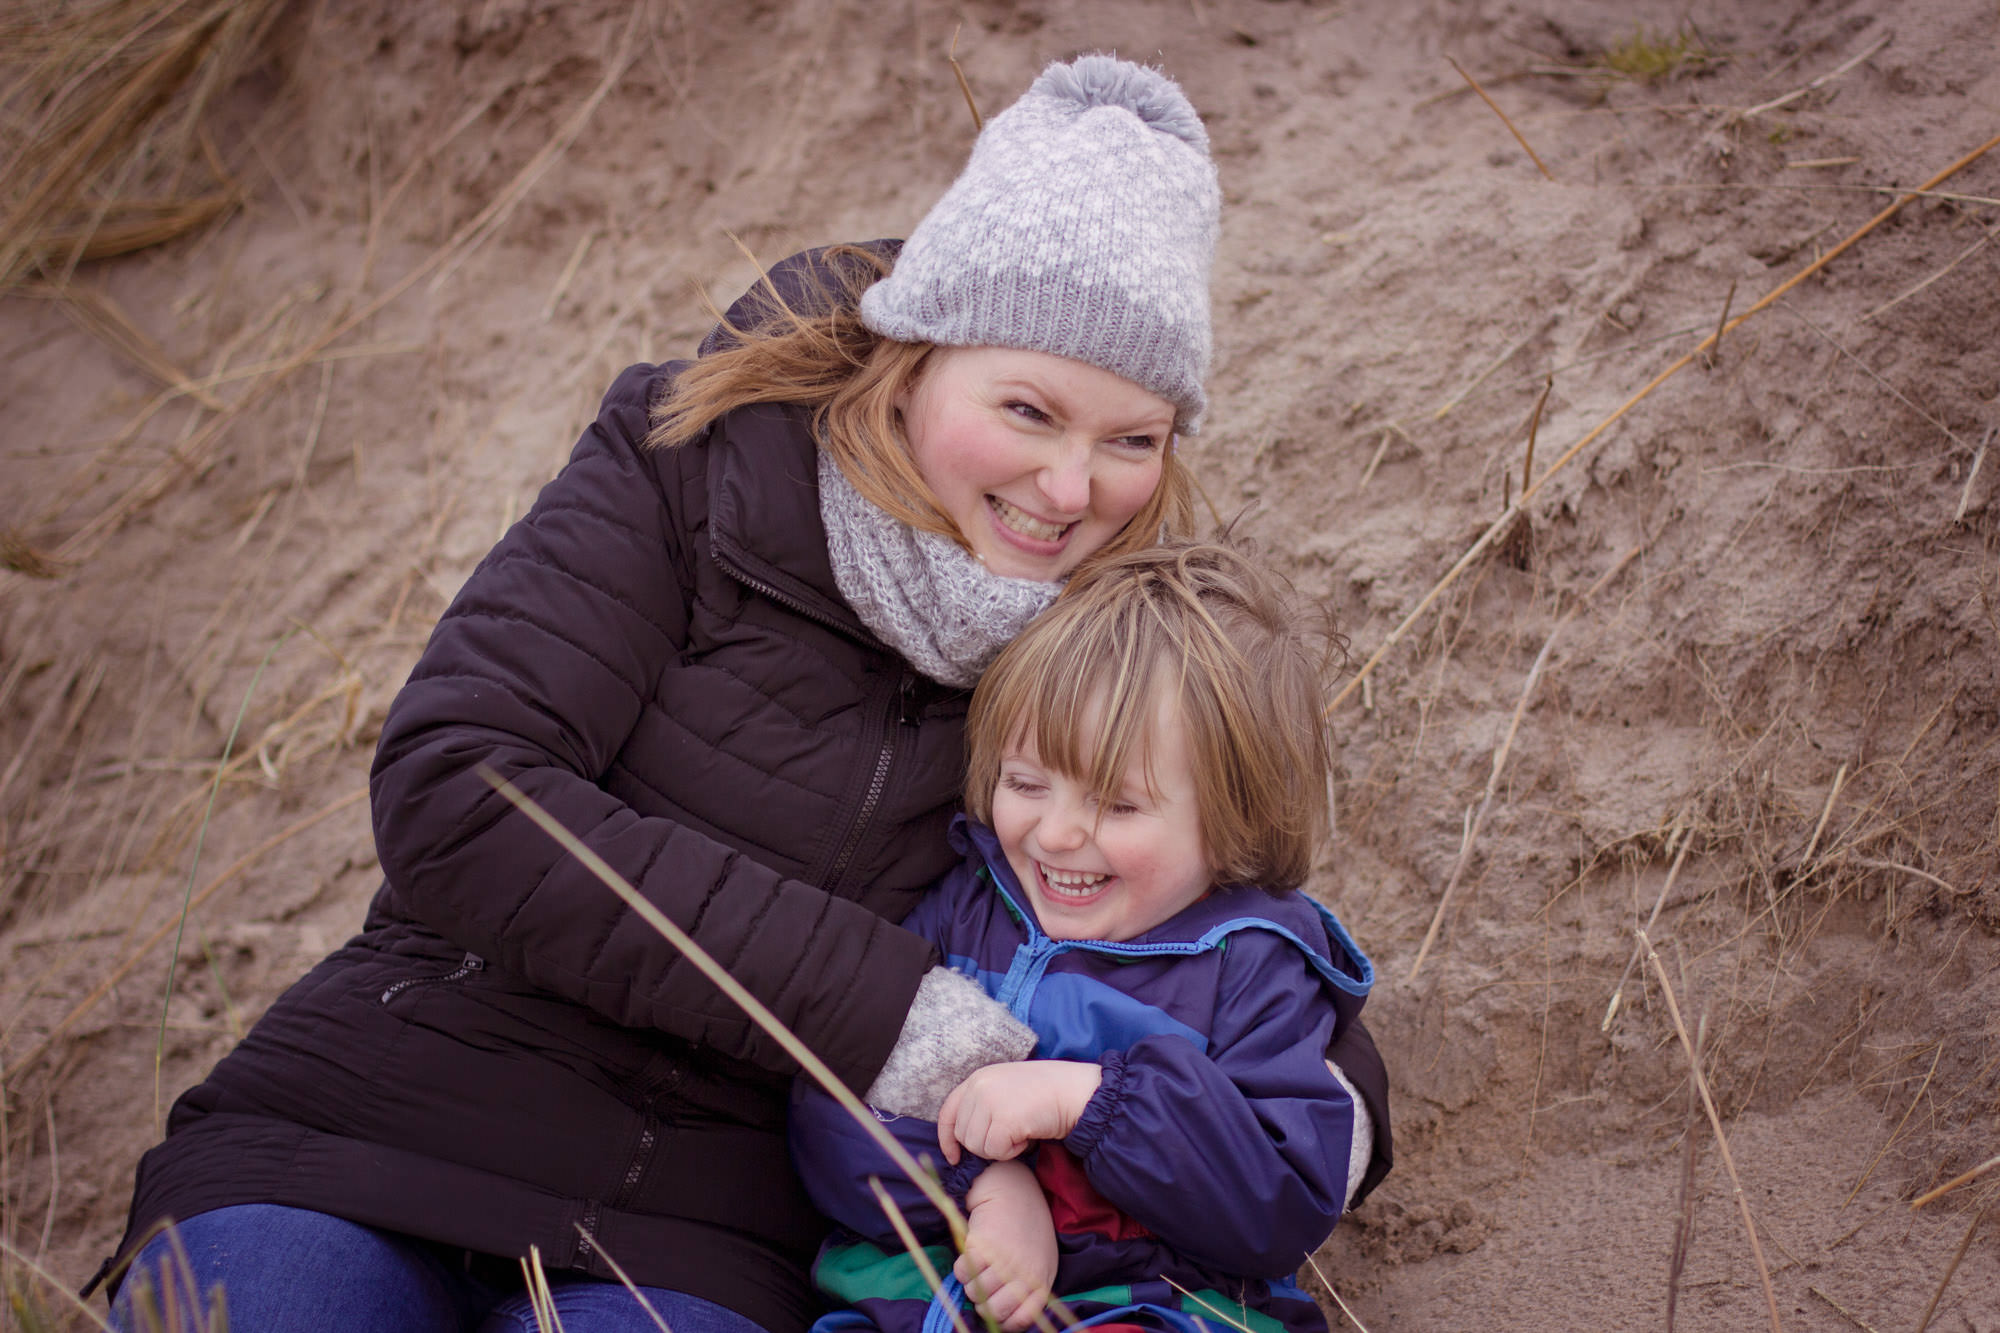 autumn and winter outdoor family photo shoots NORTH COAST northern ireland